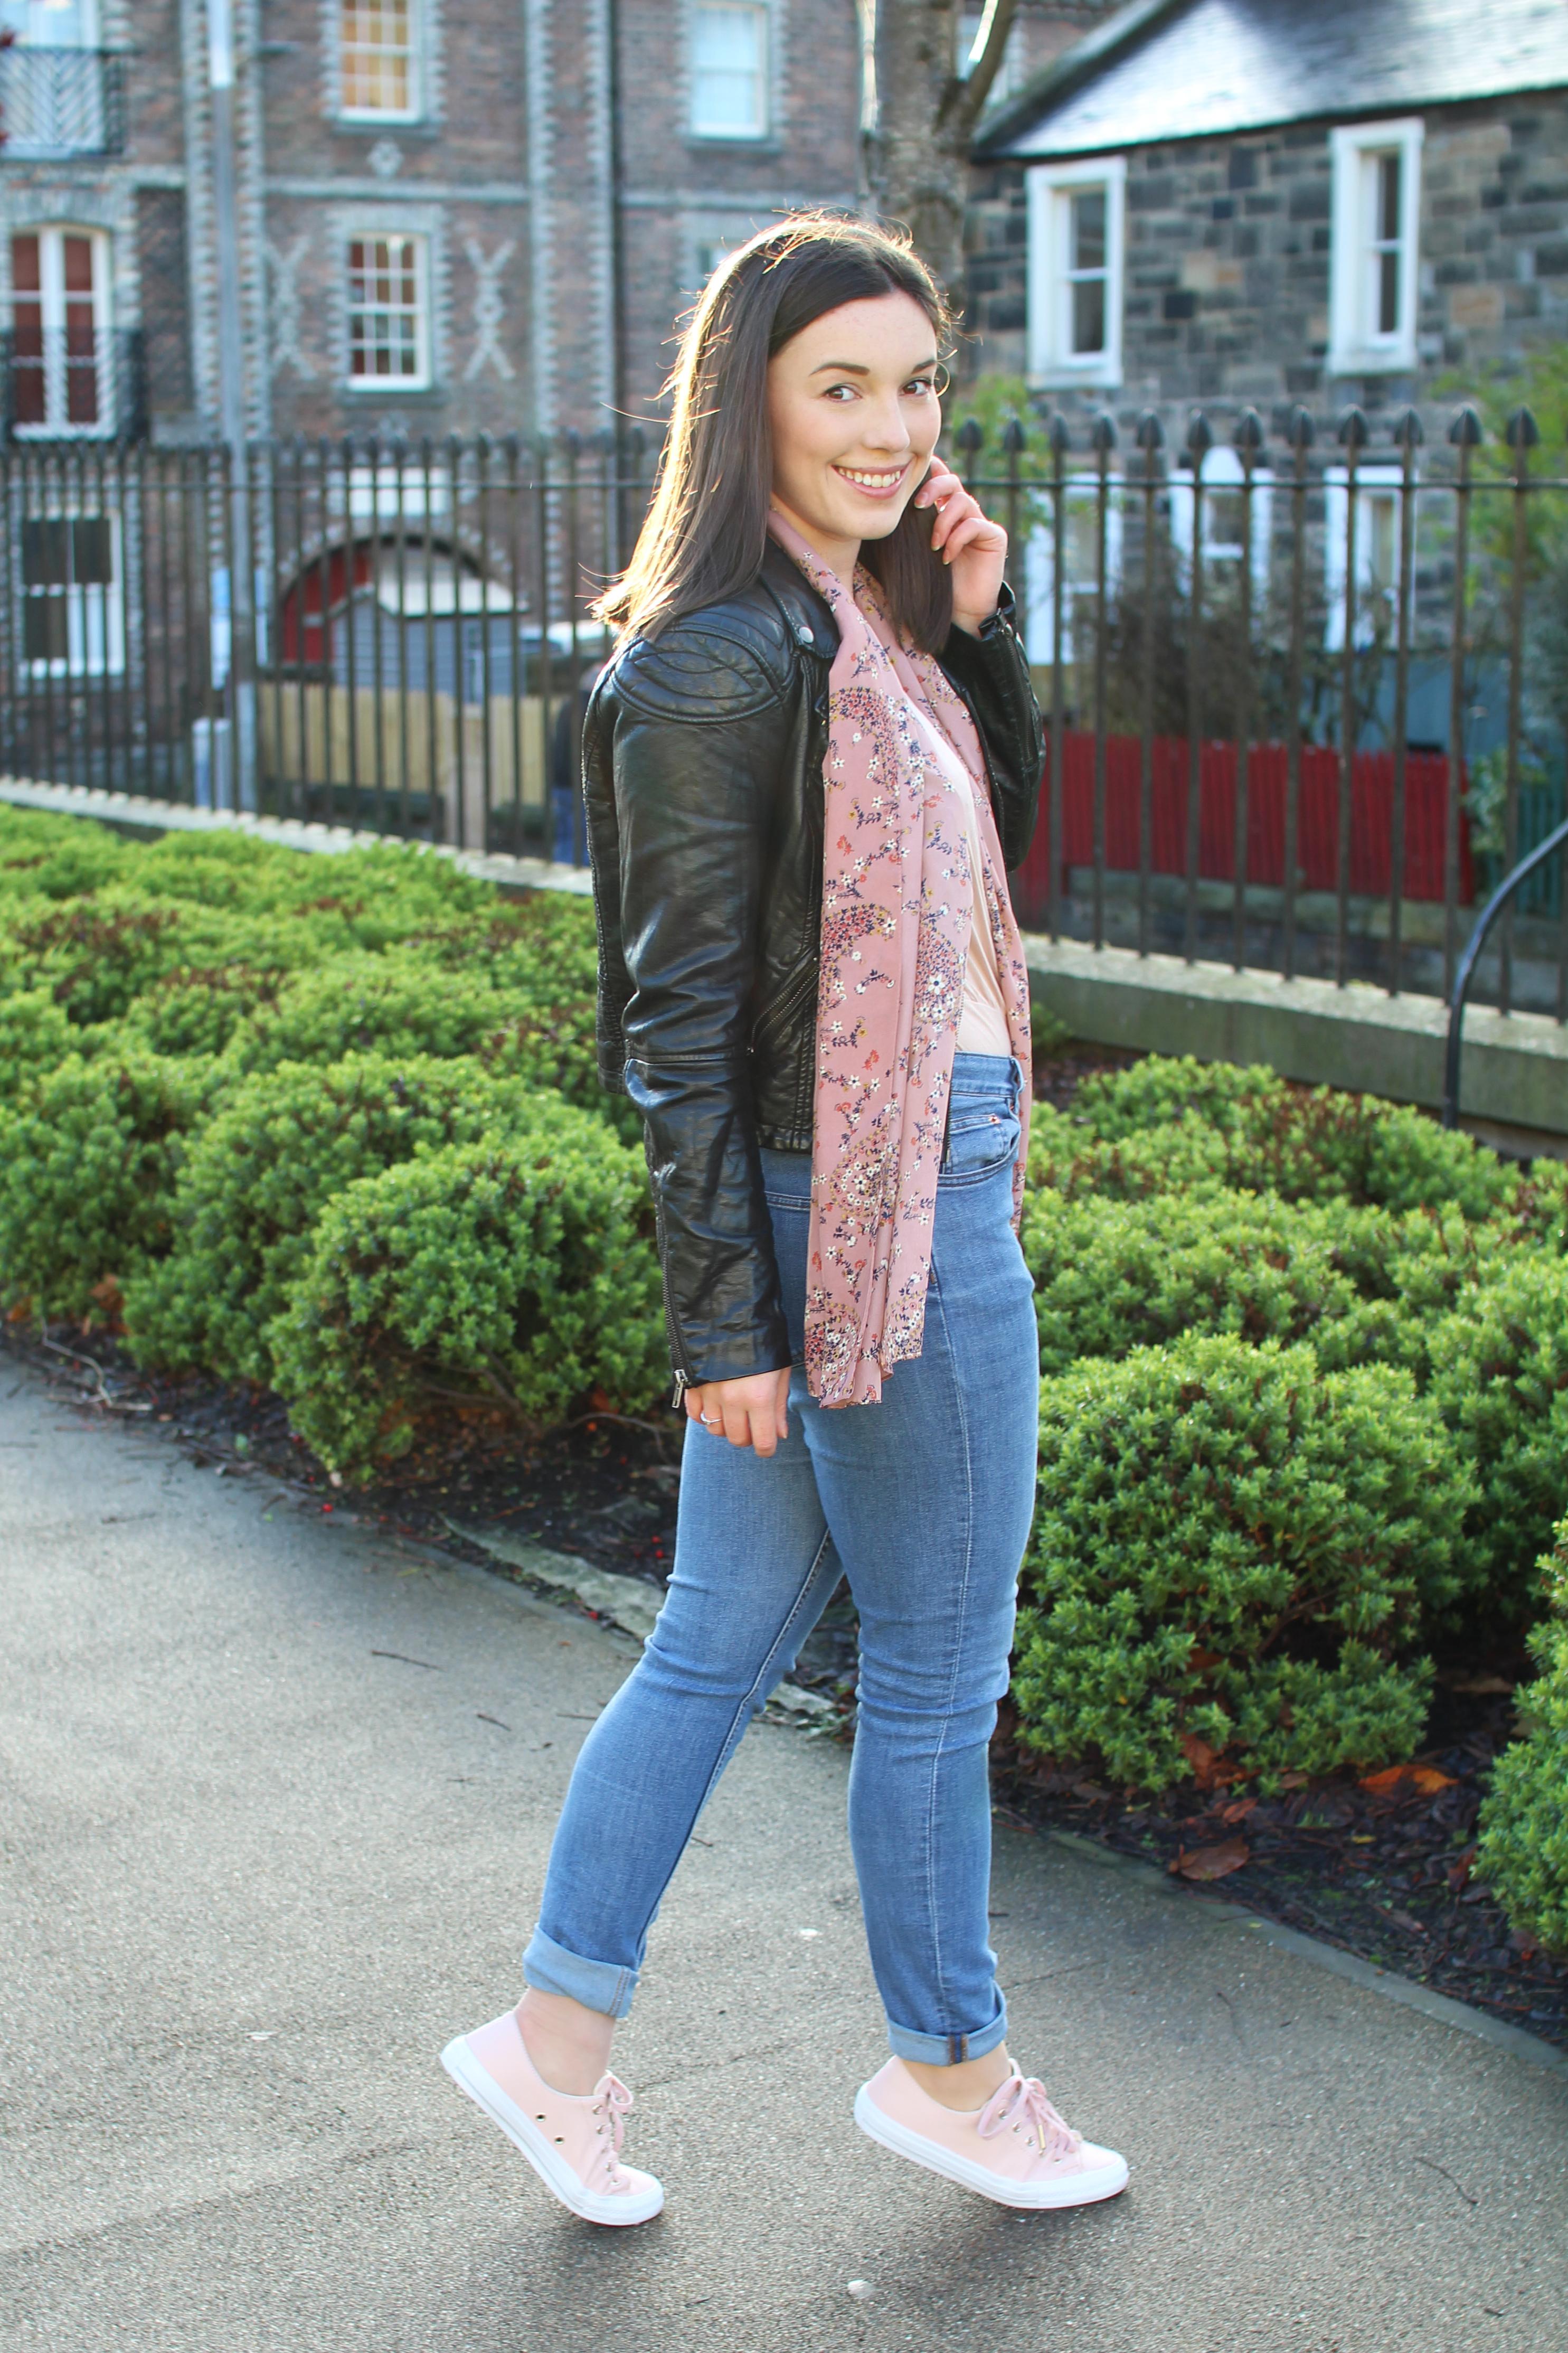 UK fashion lifestyle outfits blogger Scotland Edinburgh The Little Things